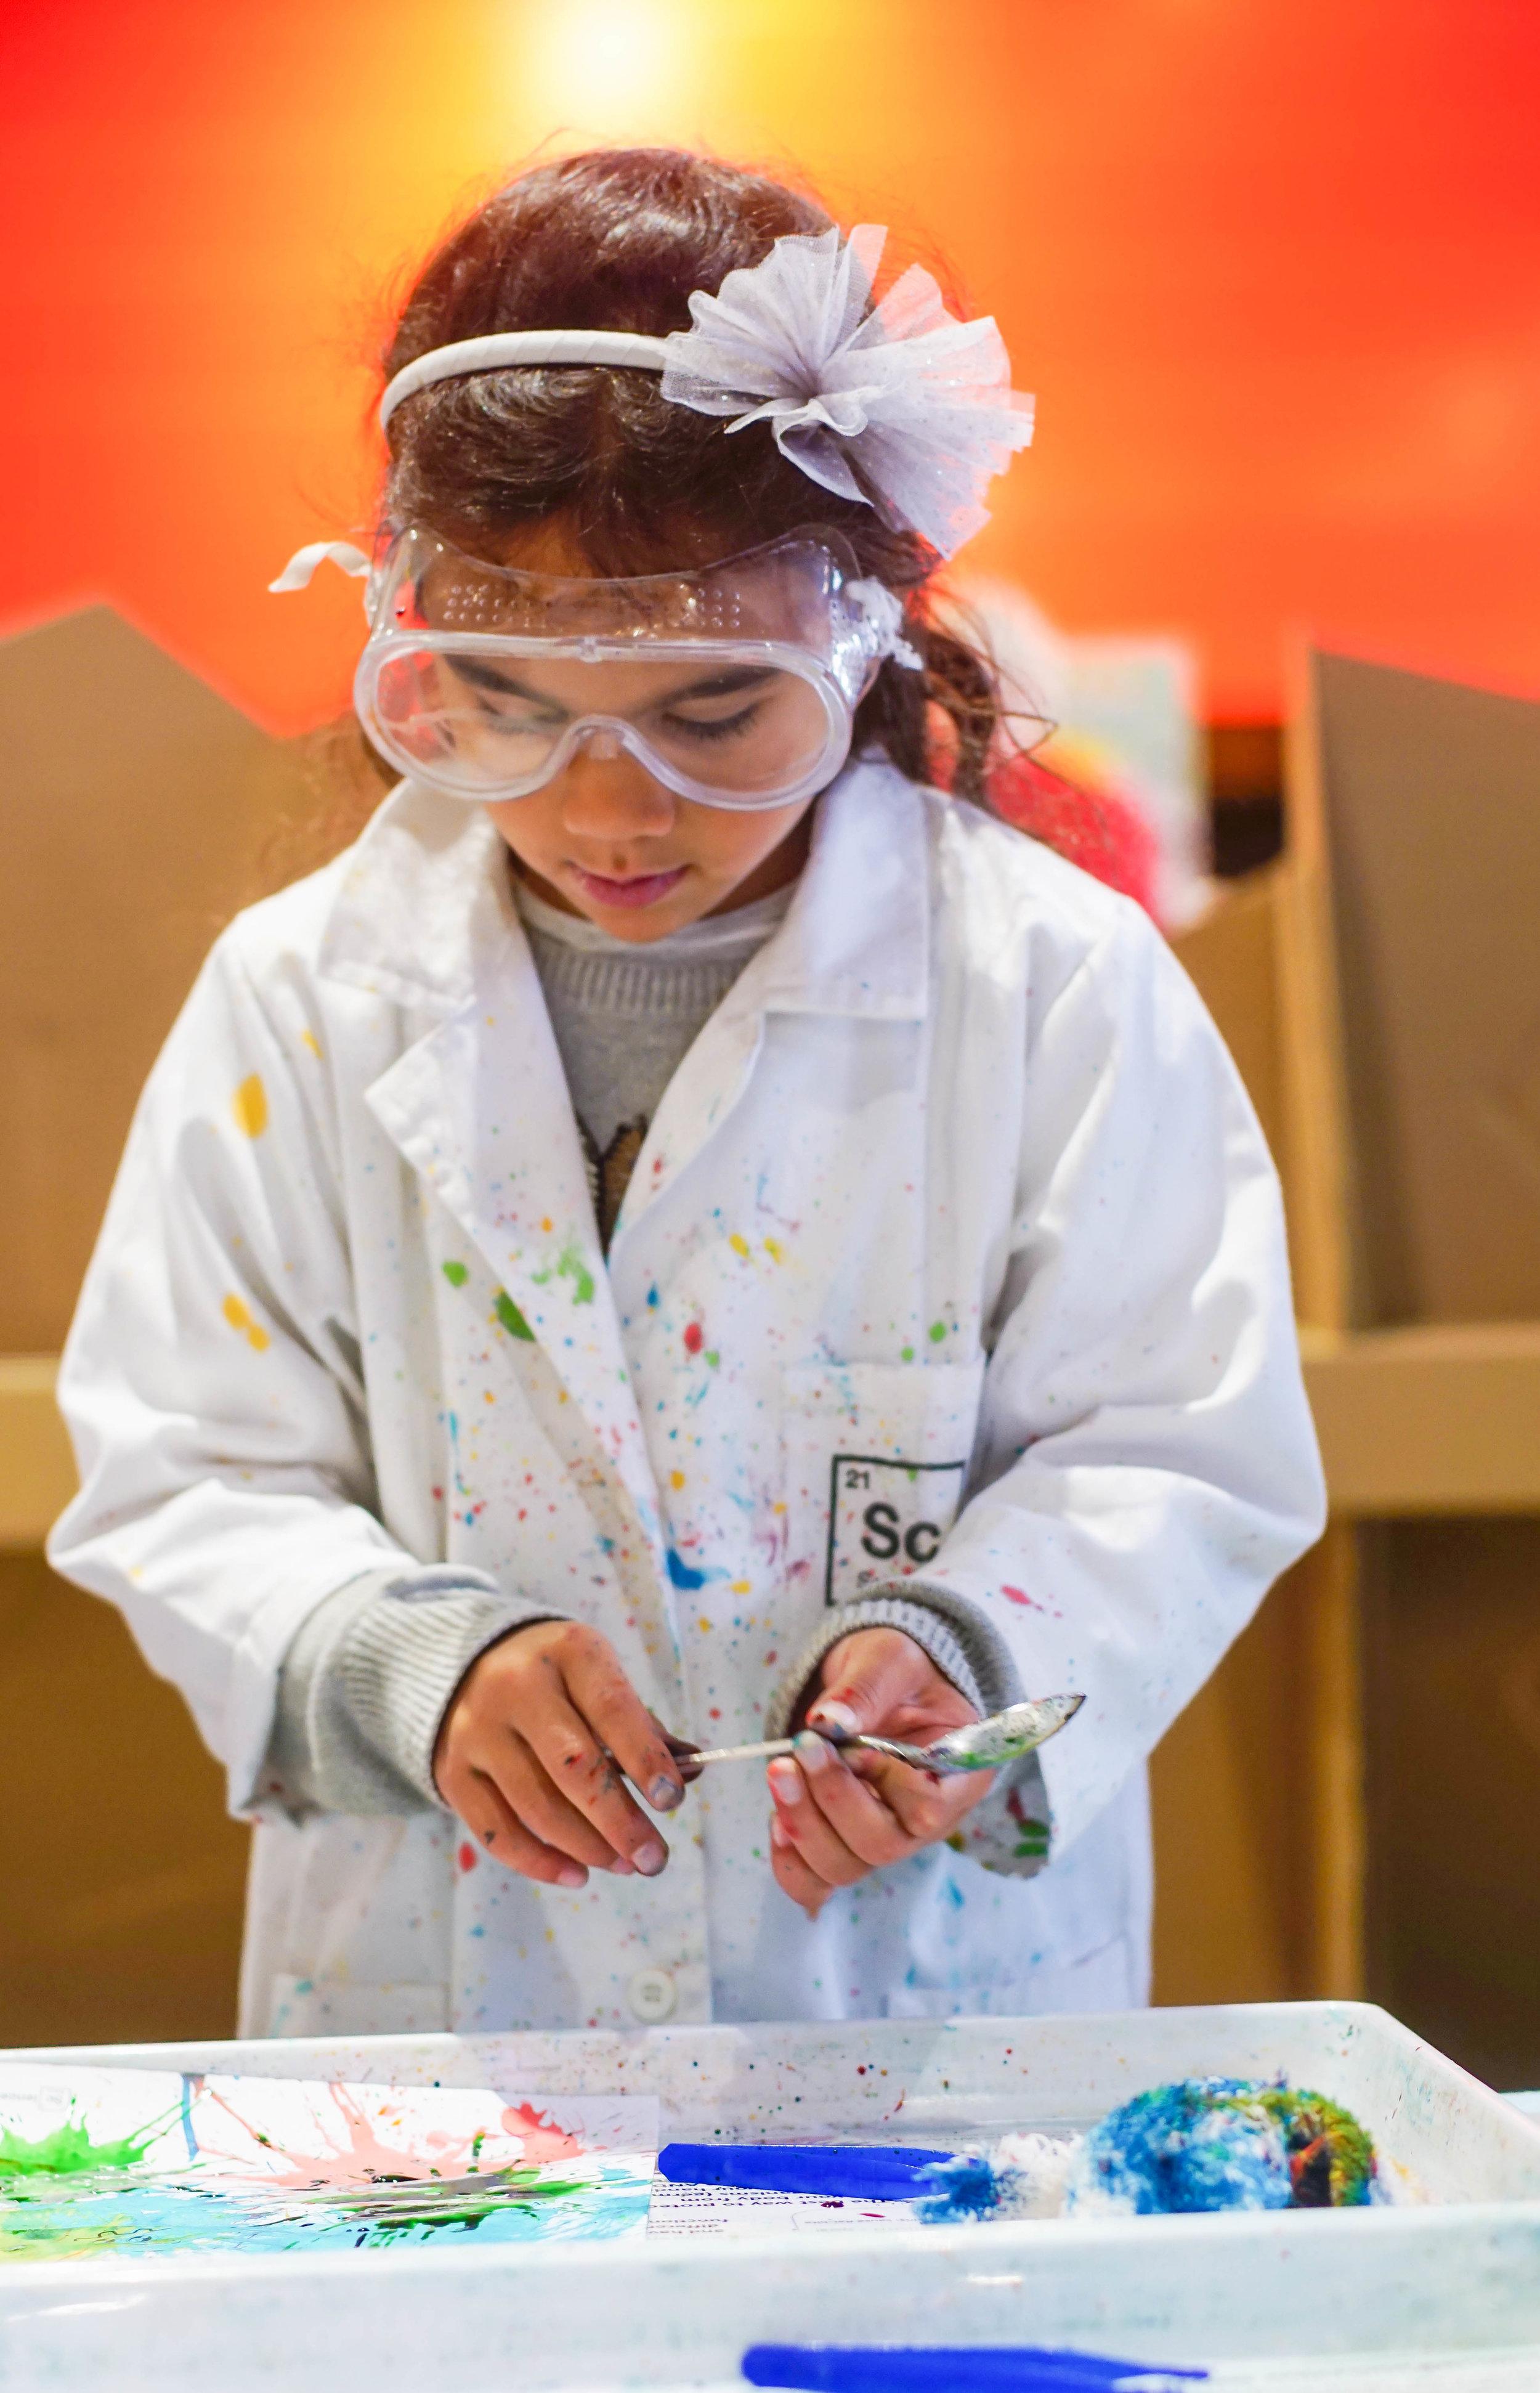 SciencePlay Kids - Little Life Lab Woodgrove Melton - 33-30.jpg